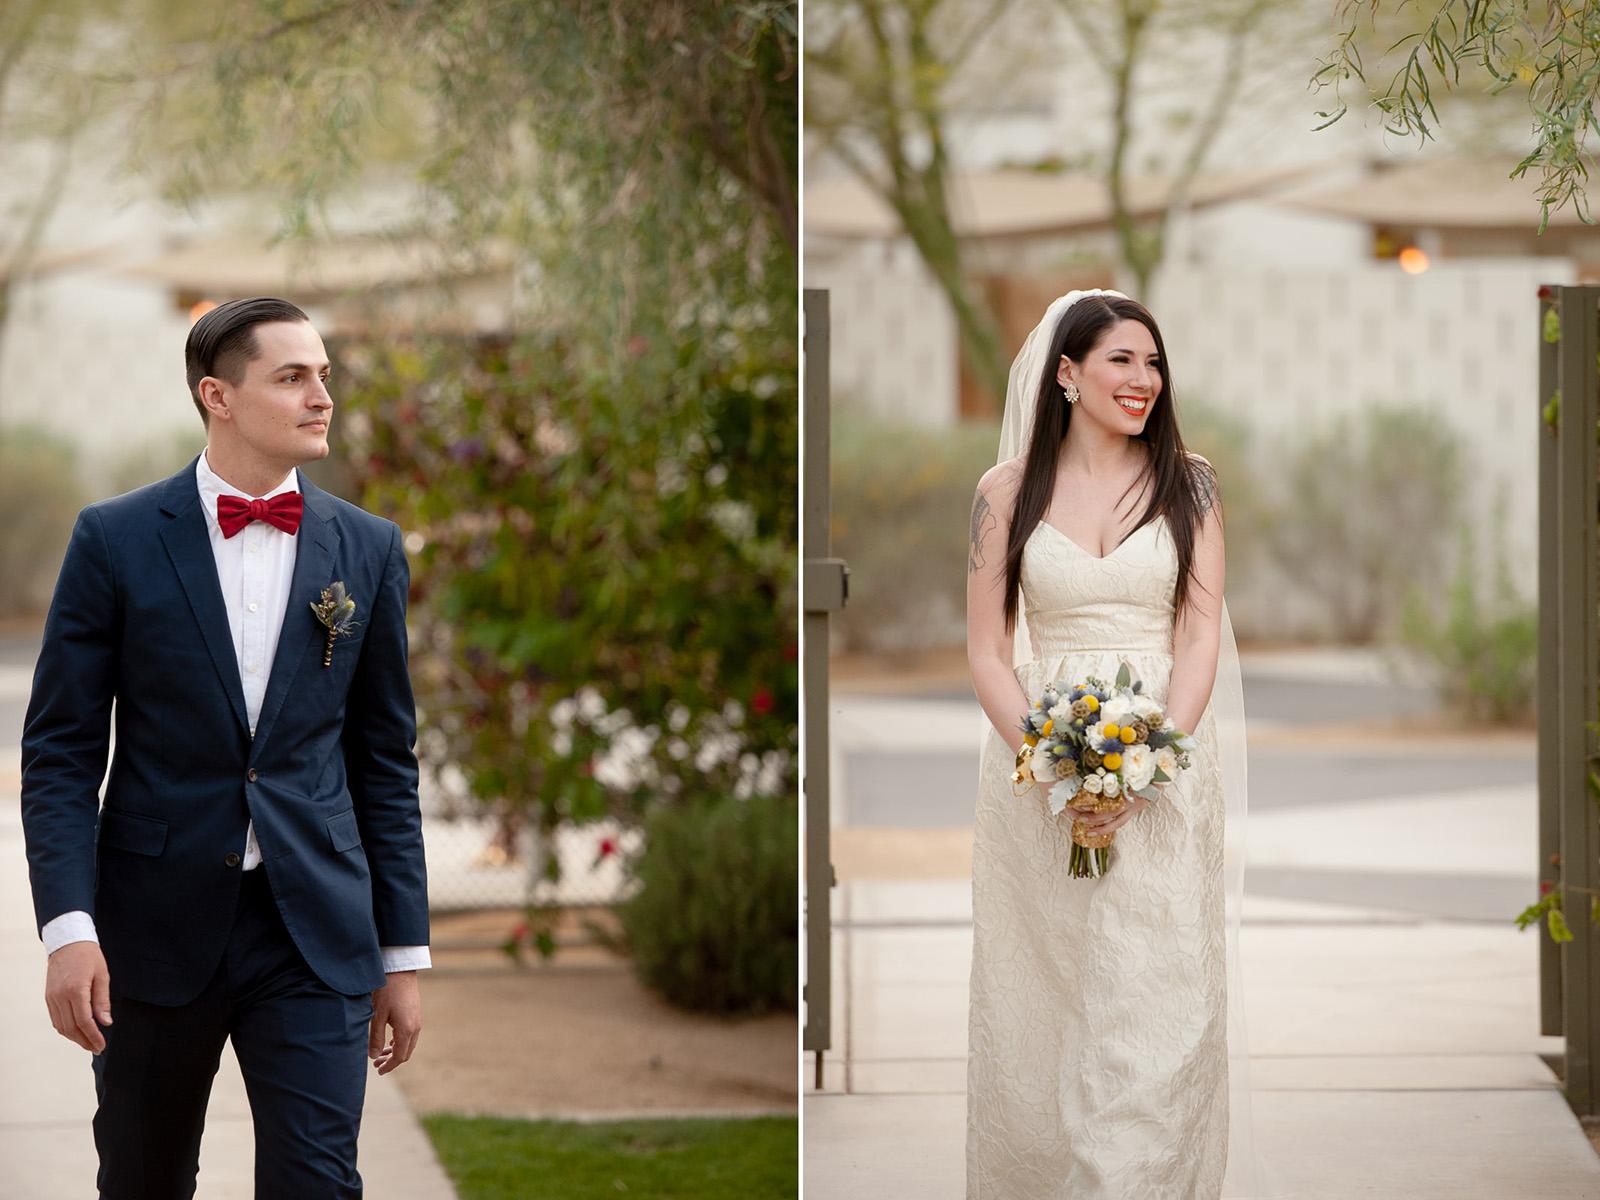 ace-hotel-palm-springs-wedding-45.jpg